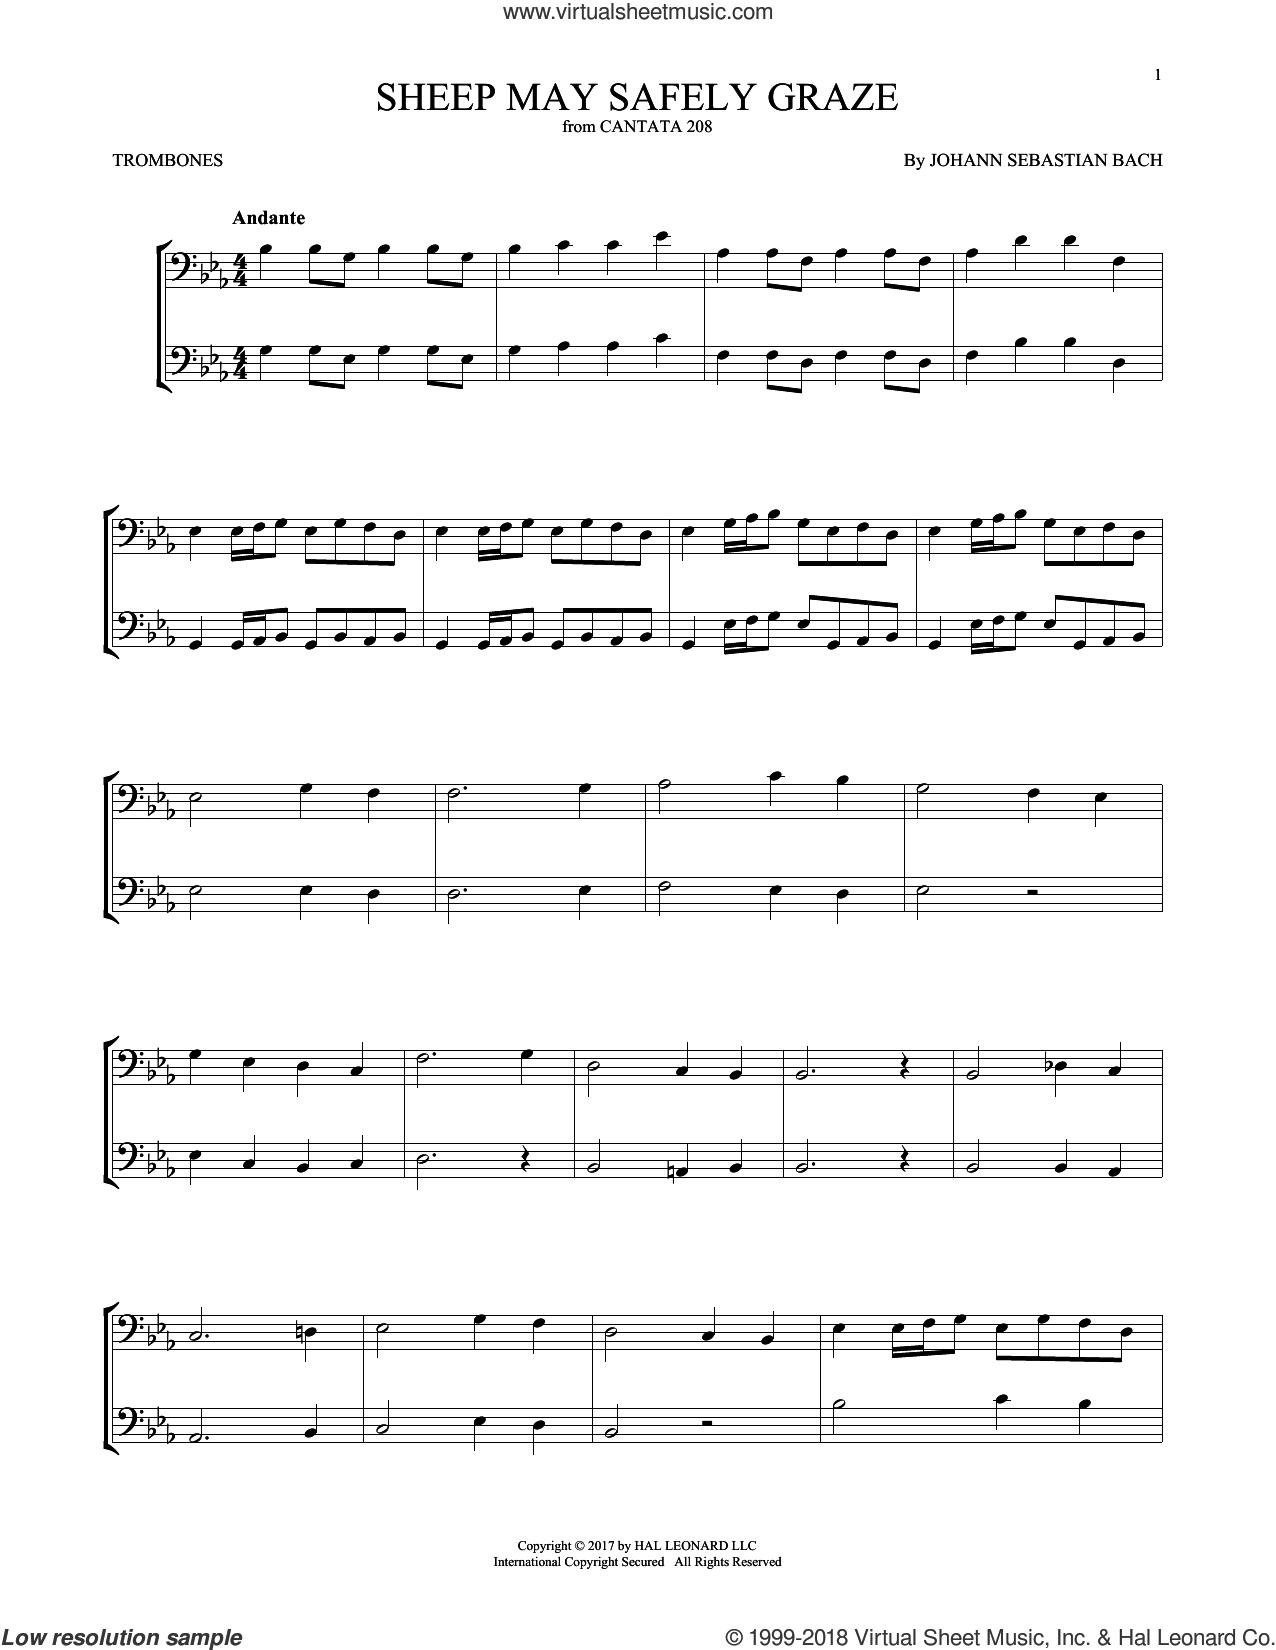 Sheep May Safely Graze sheet music for two trombones (duet, duets) by Johann Sebastian Bach, classical score, intermediate skill level